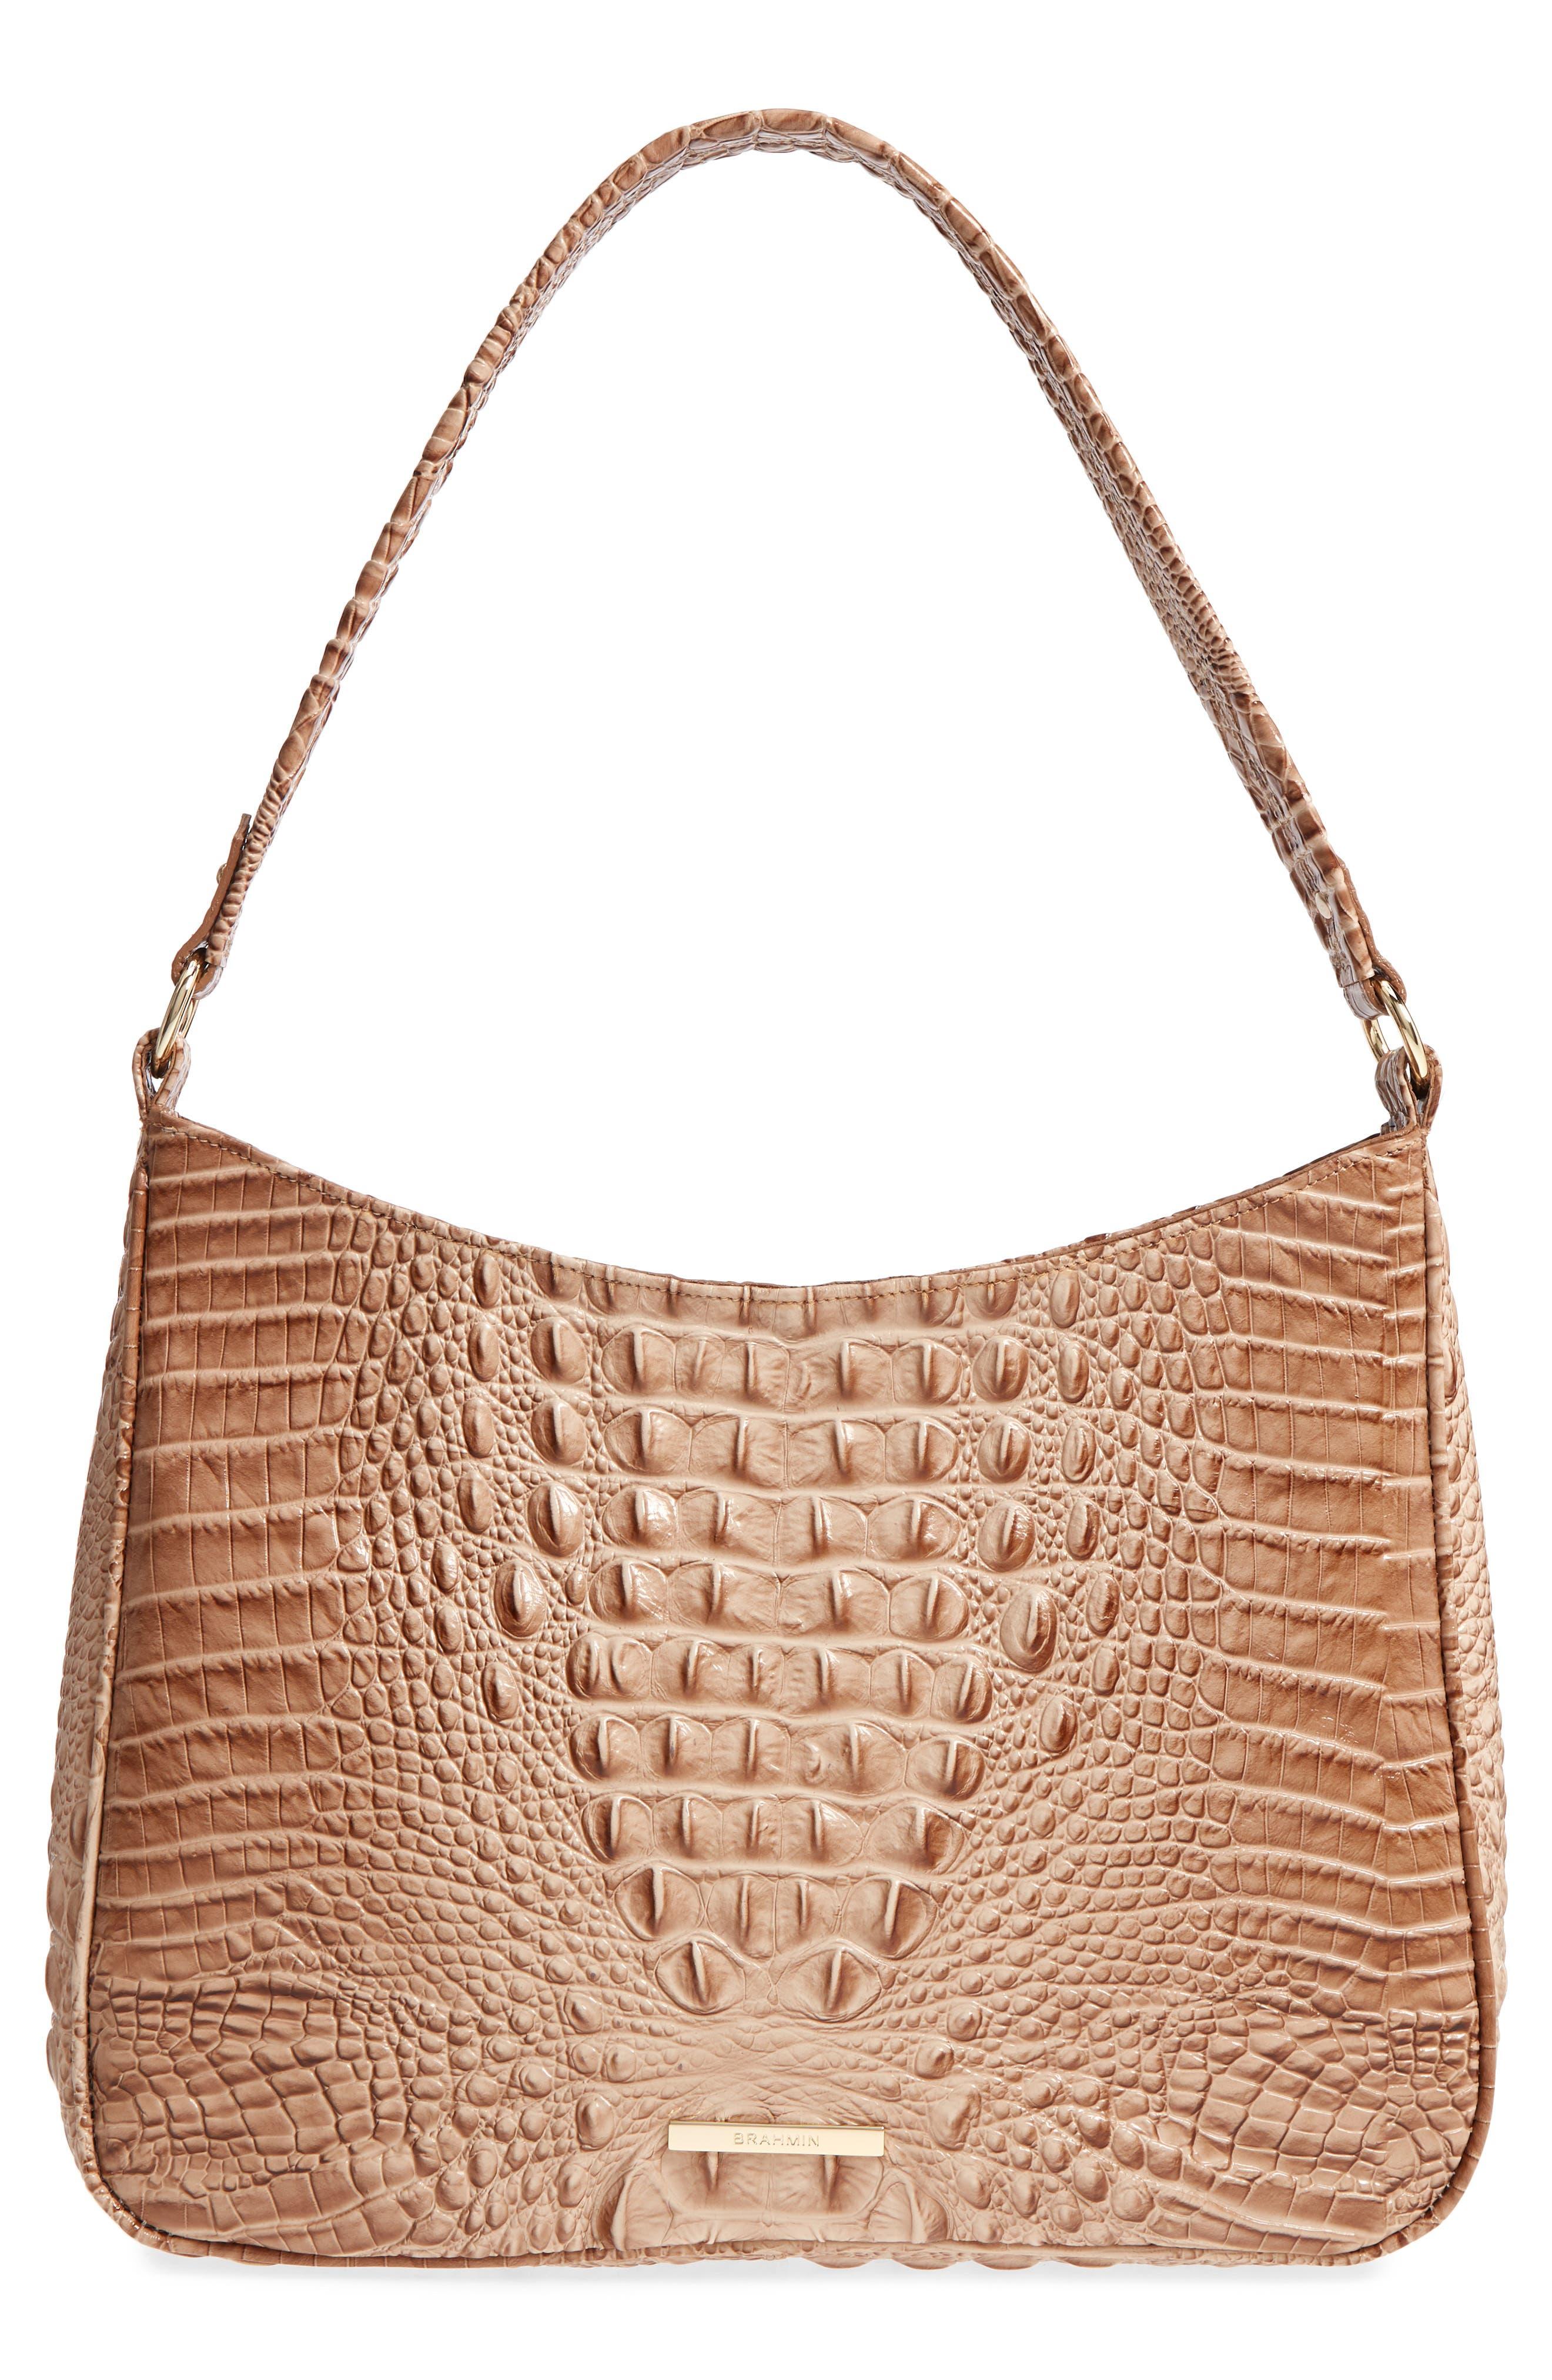 Nadia Croc Embossed Leather Shoulder Bag,                             Main thumbnail 1, color,                             250